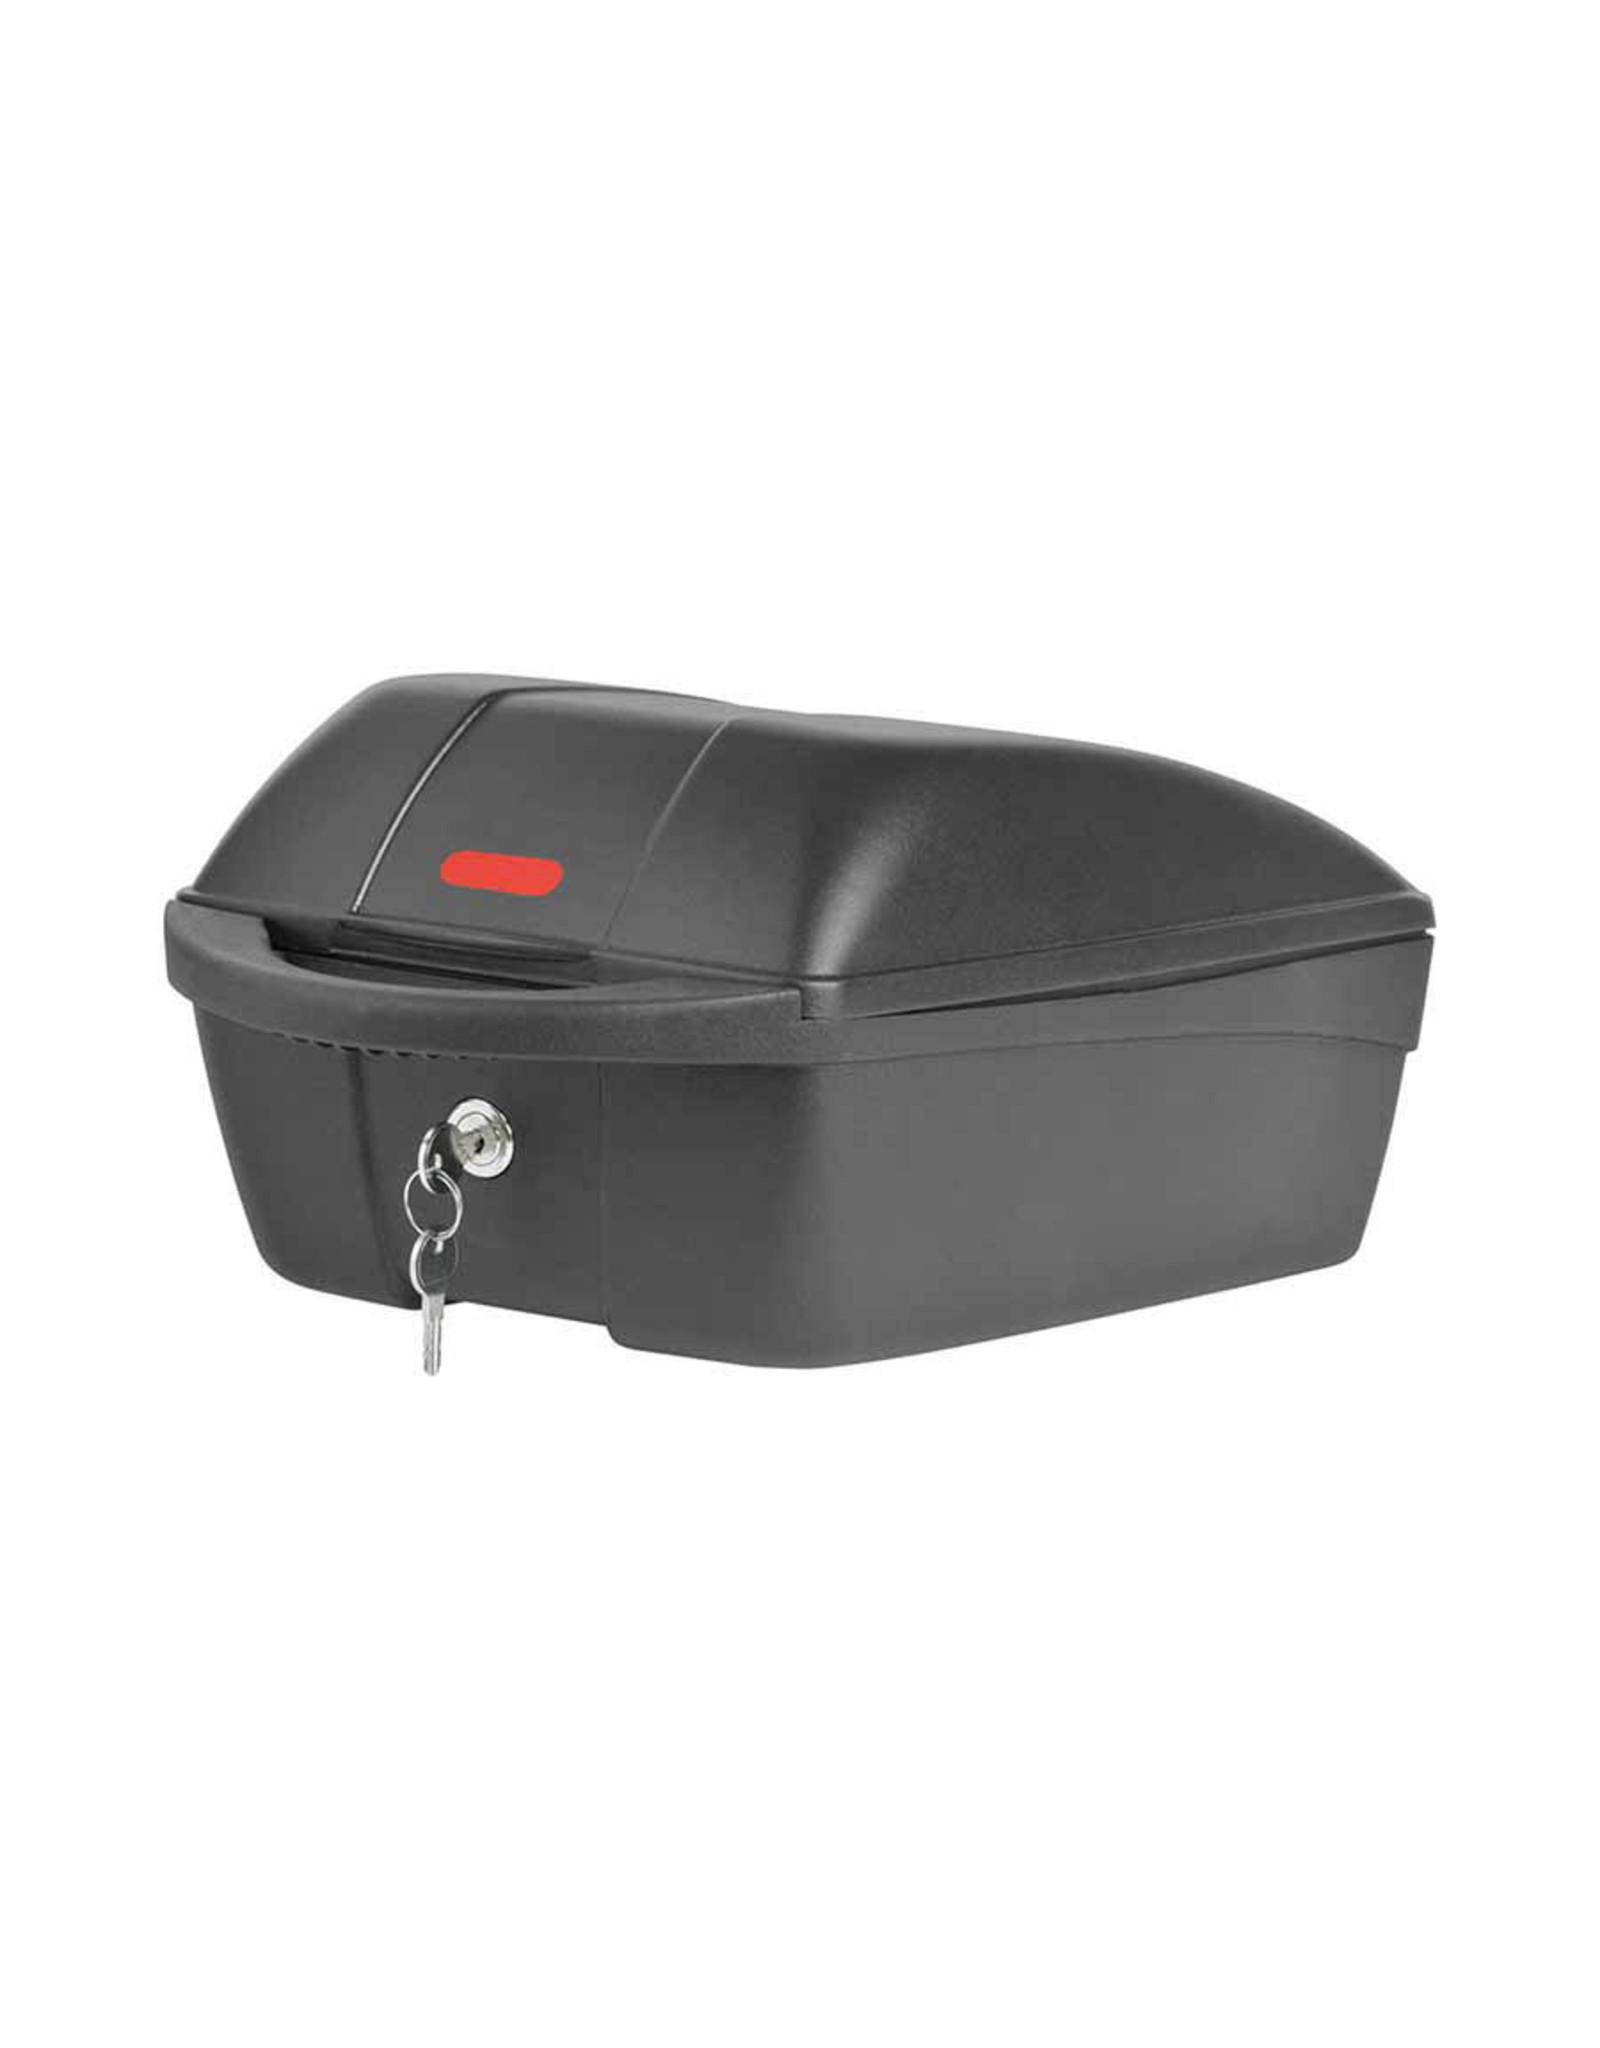 Polisport Polisport, Top Case, Basket, Rear, 538x393x439 mm, Black